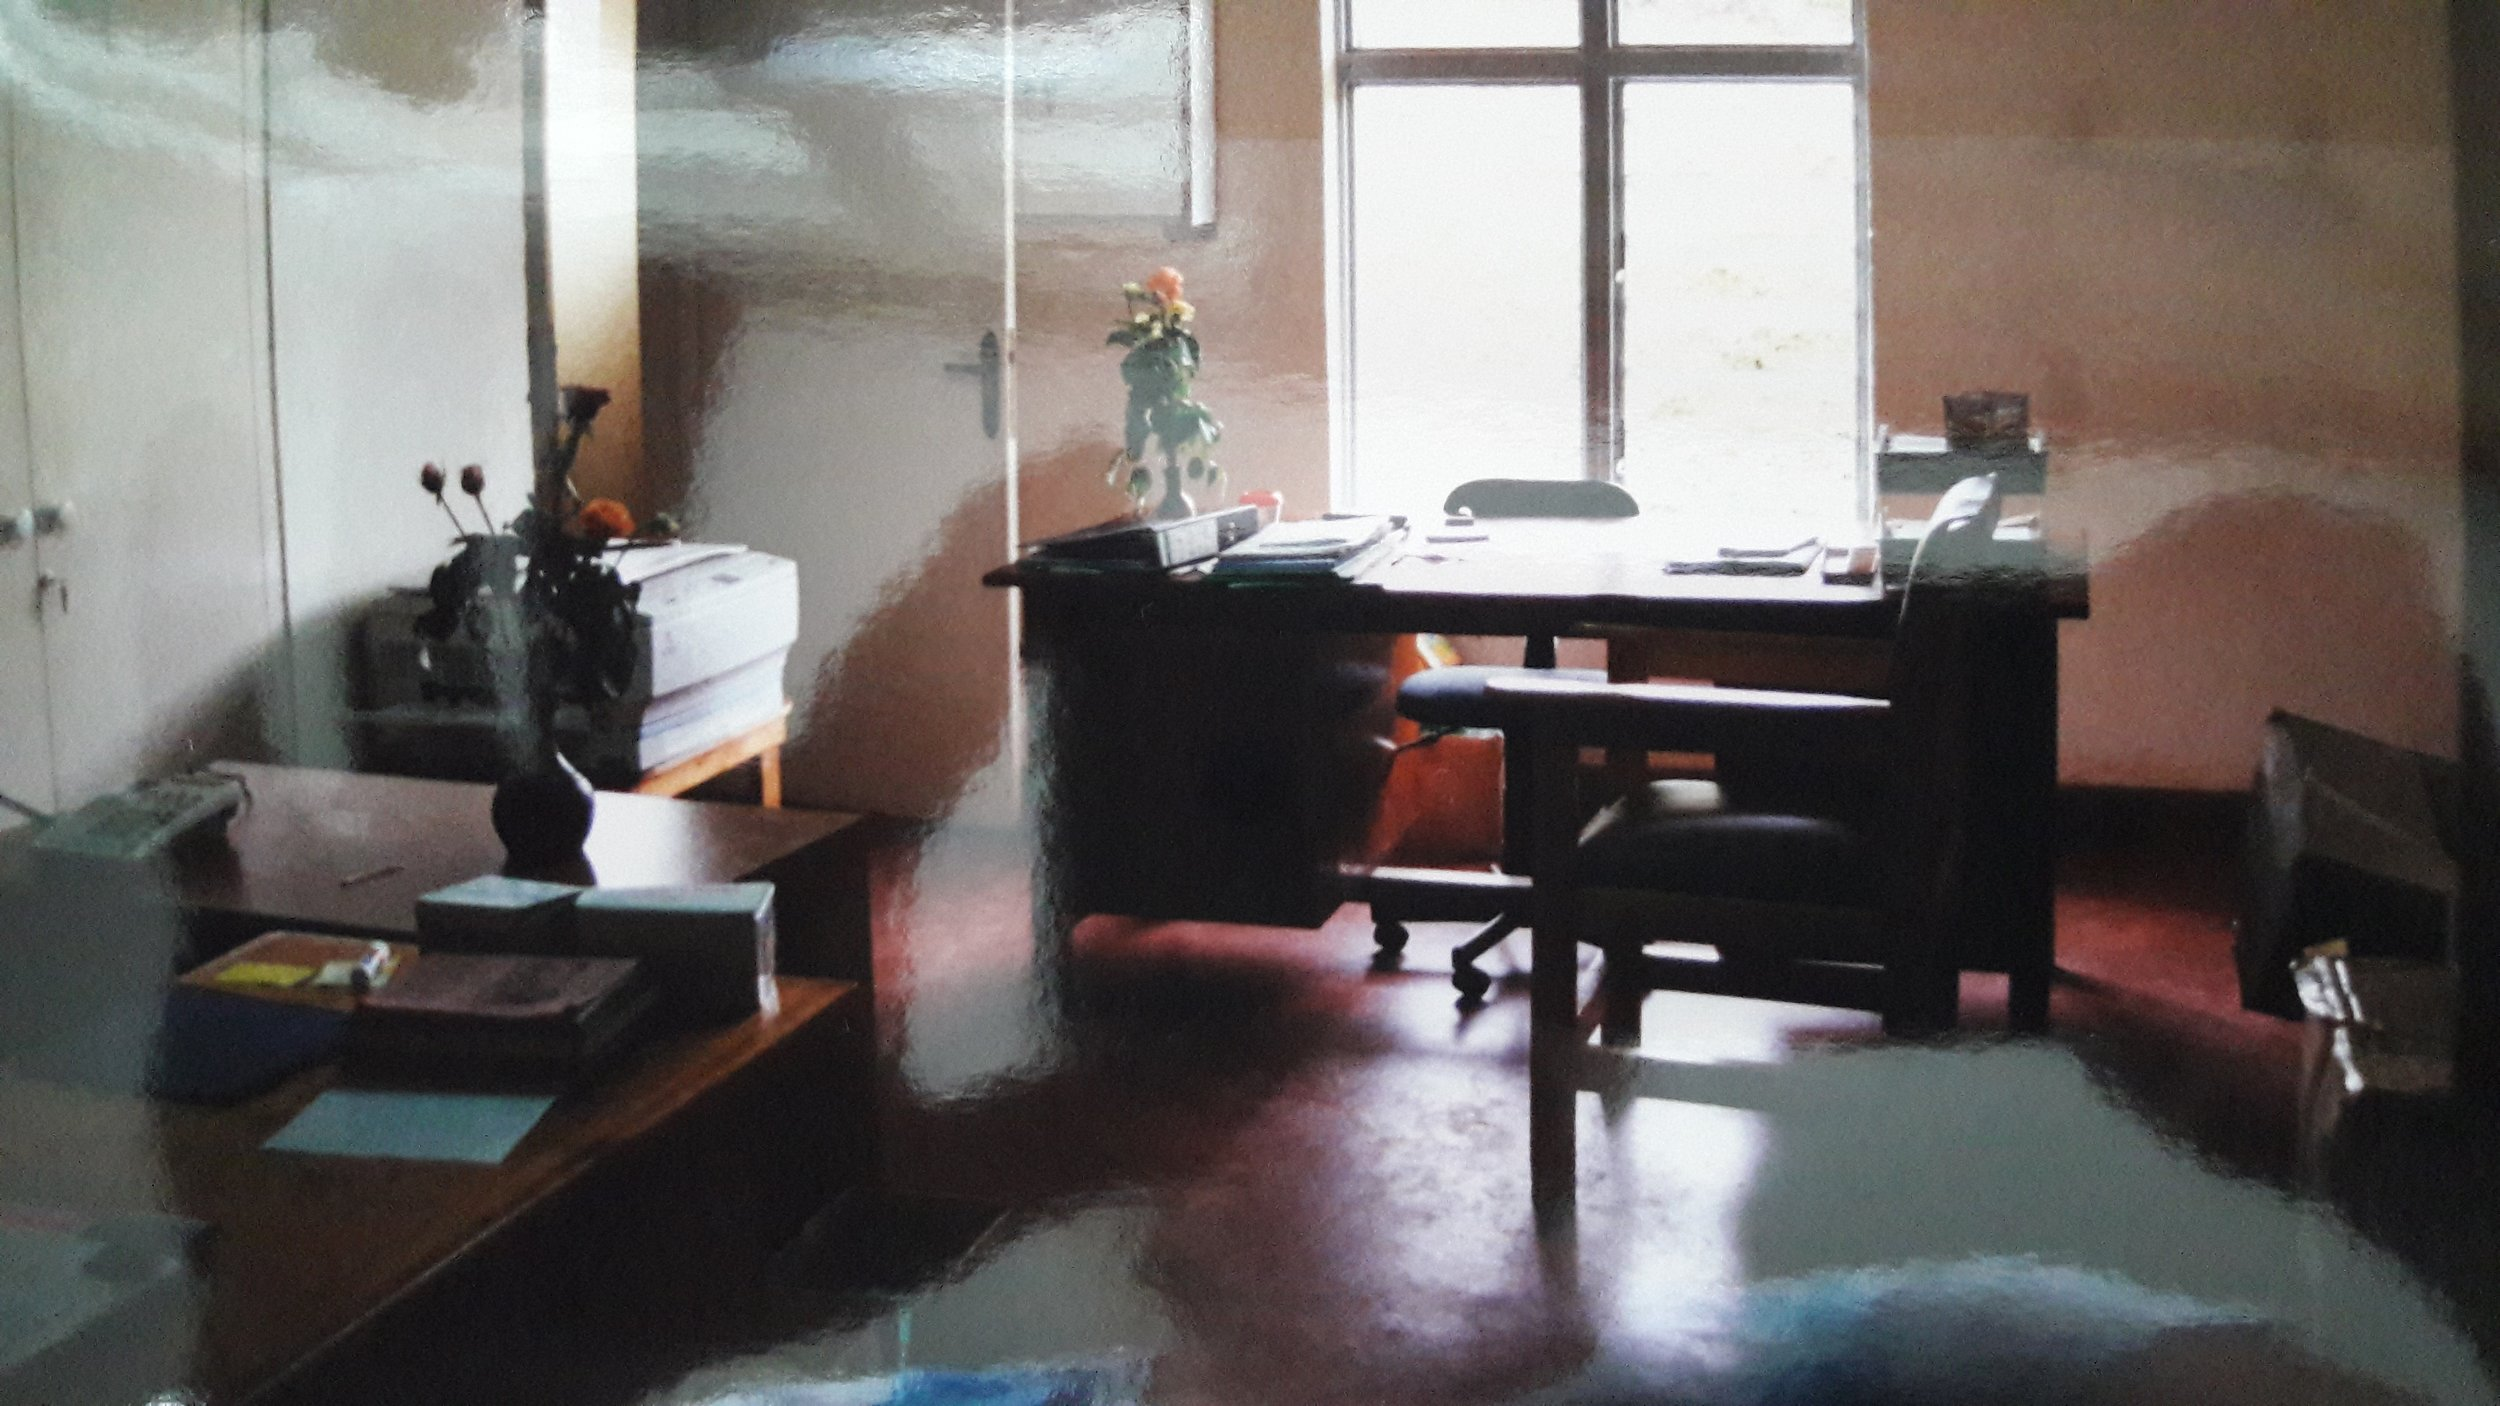 The original headmistress's office